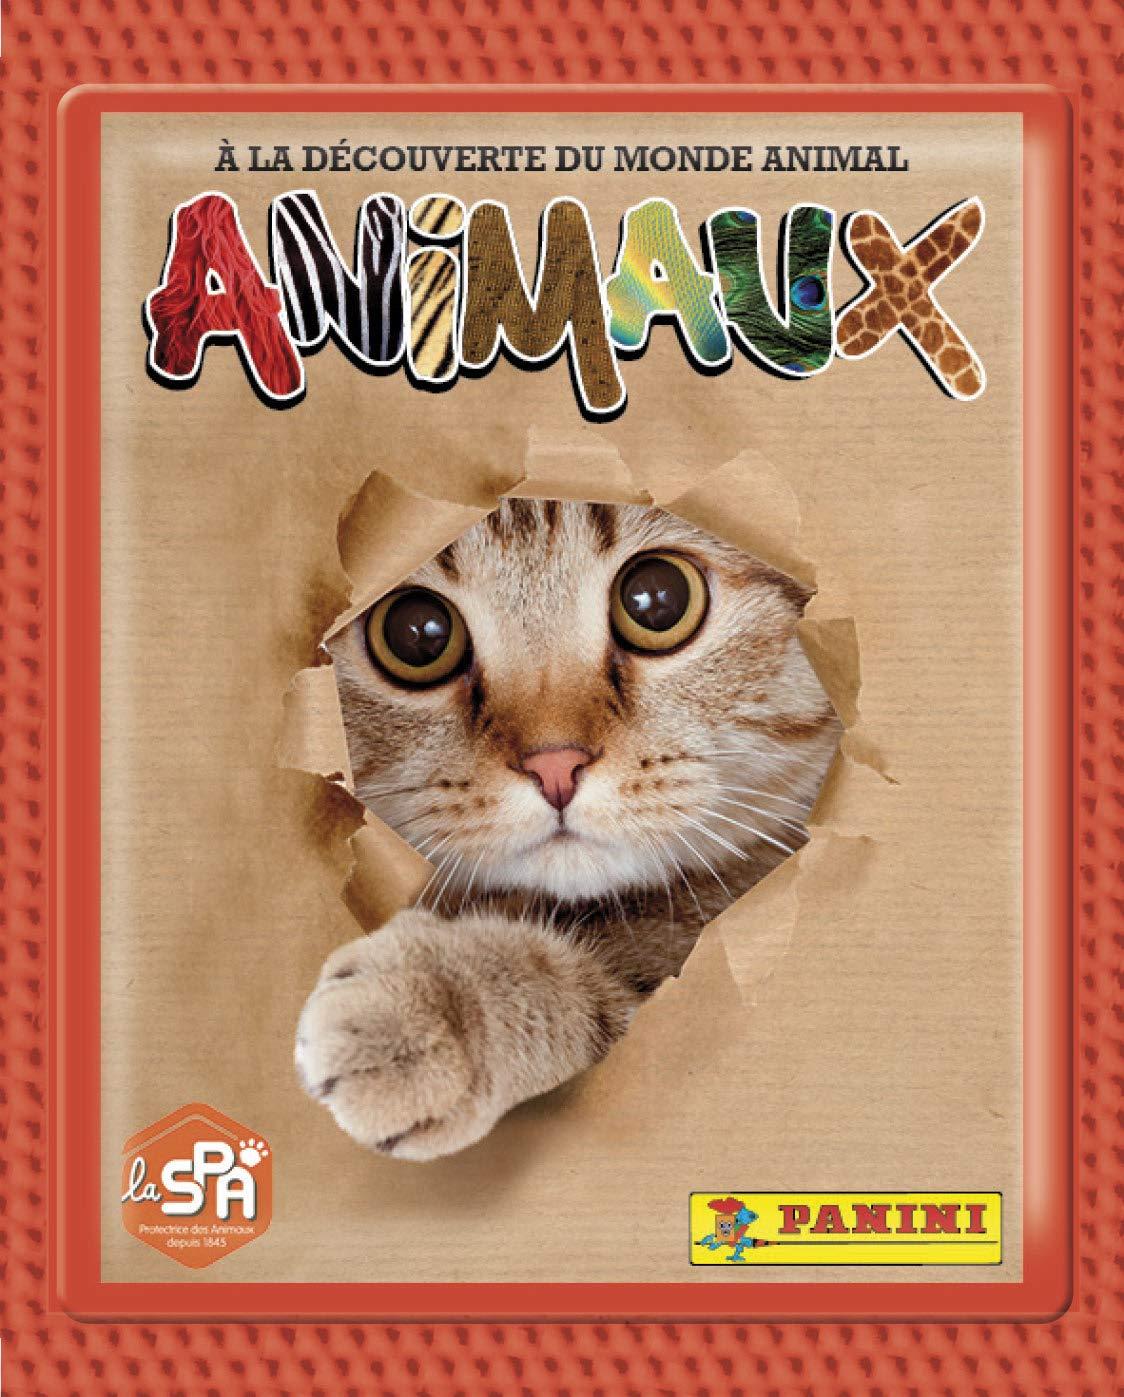 Animaux 2019 Blister 9 Pochettes 2519-038 Panini France SA SA